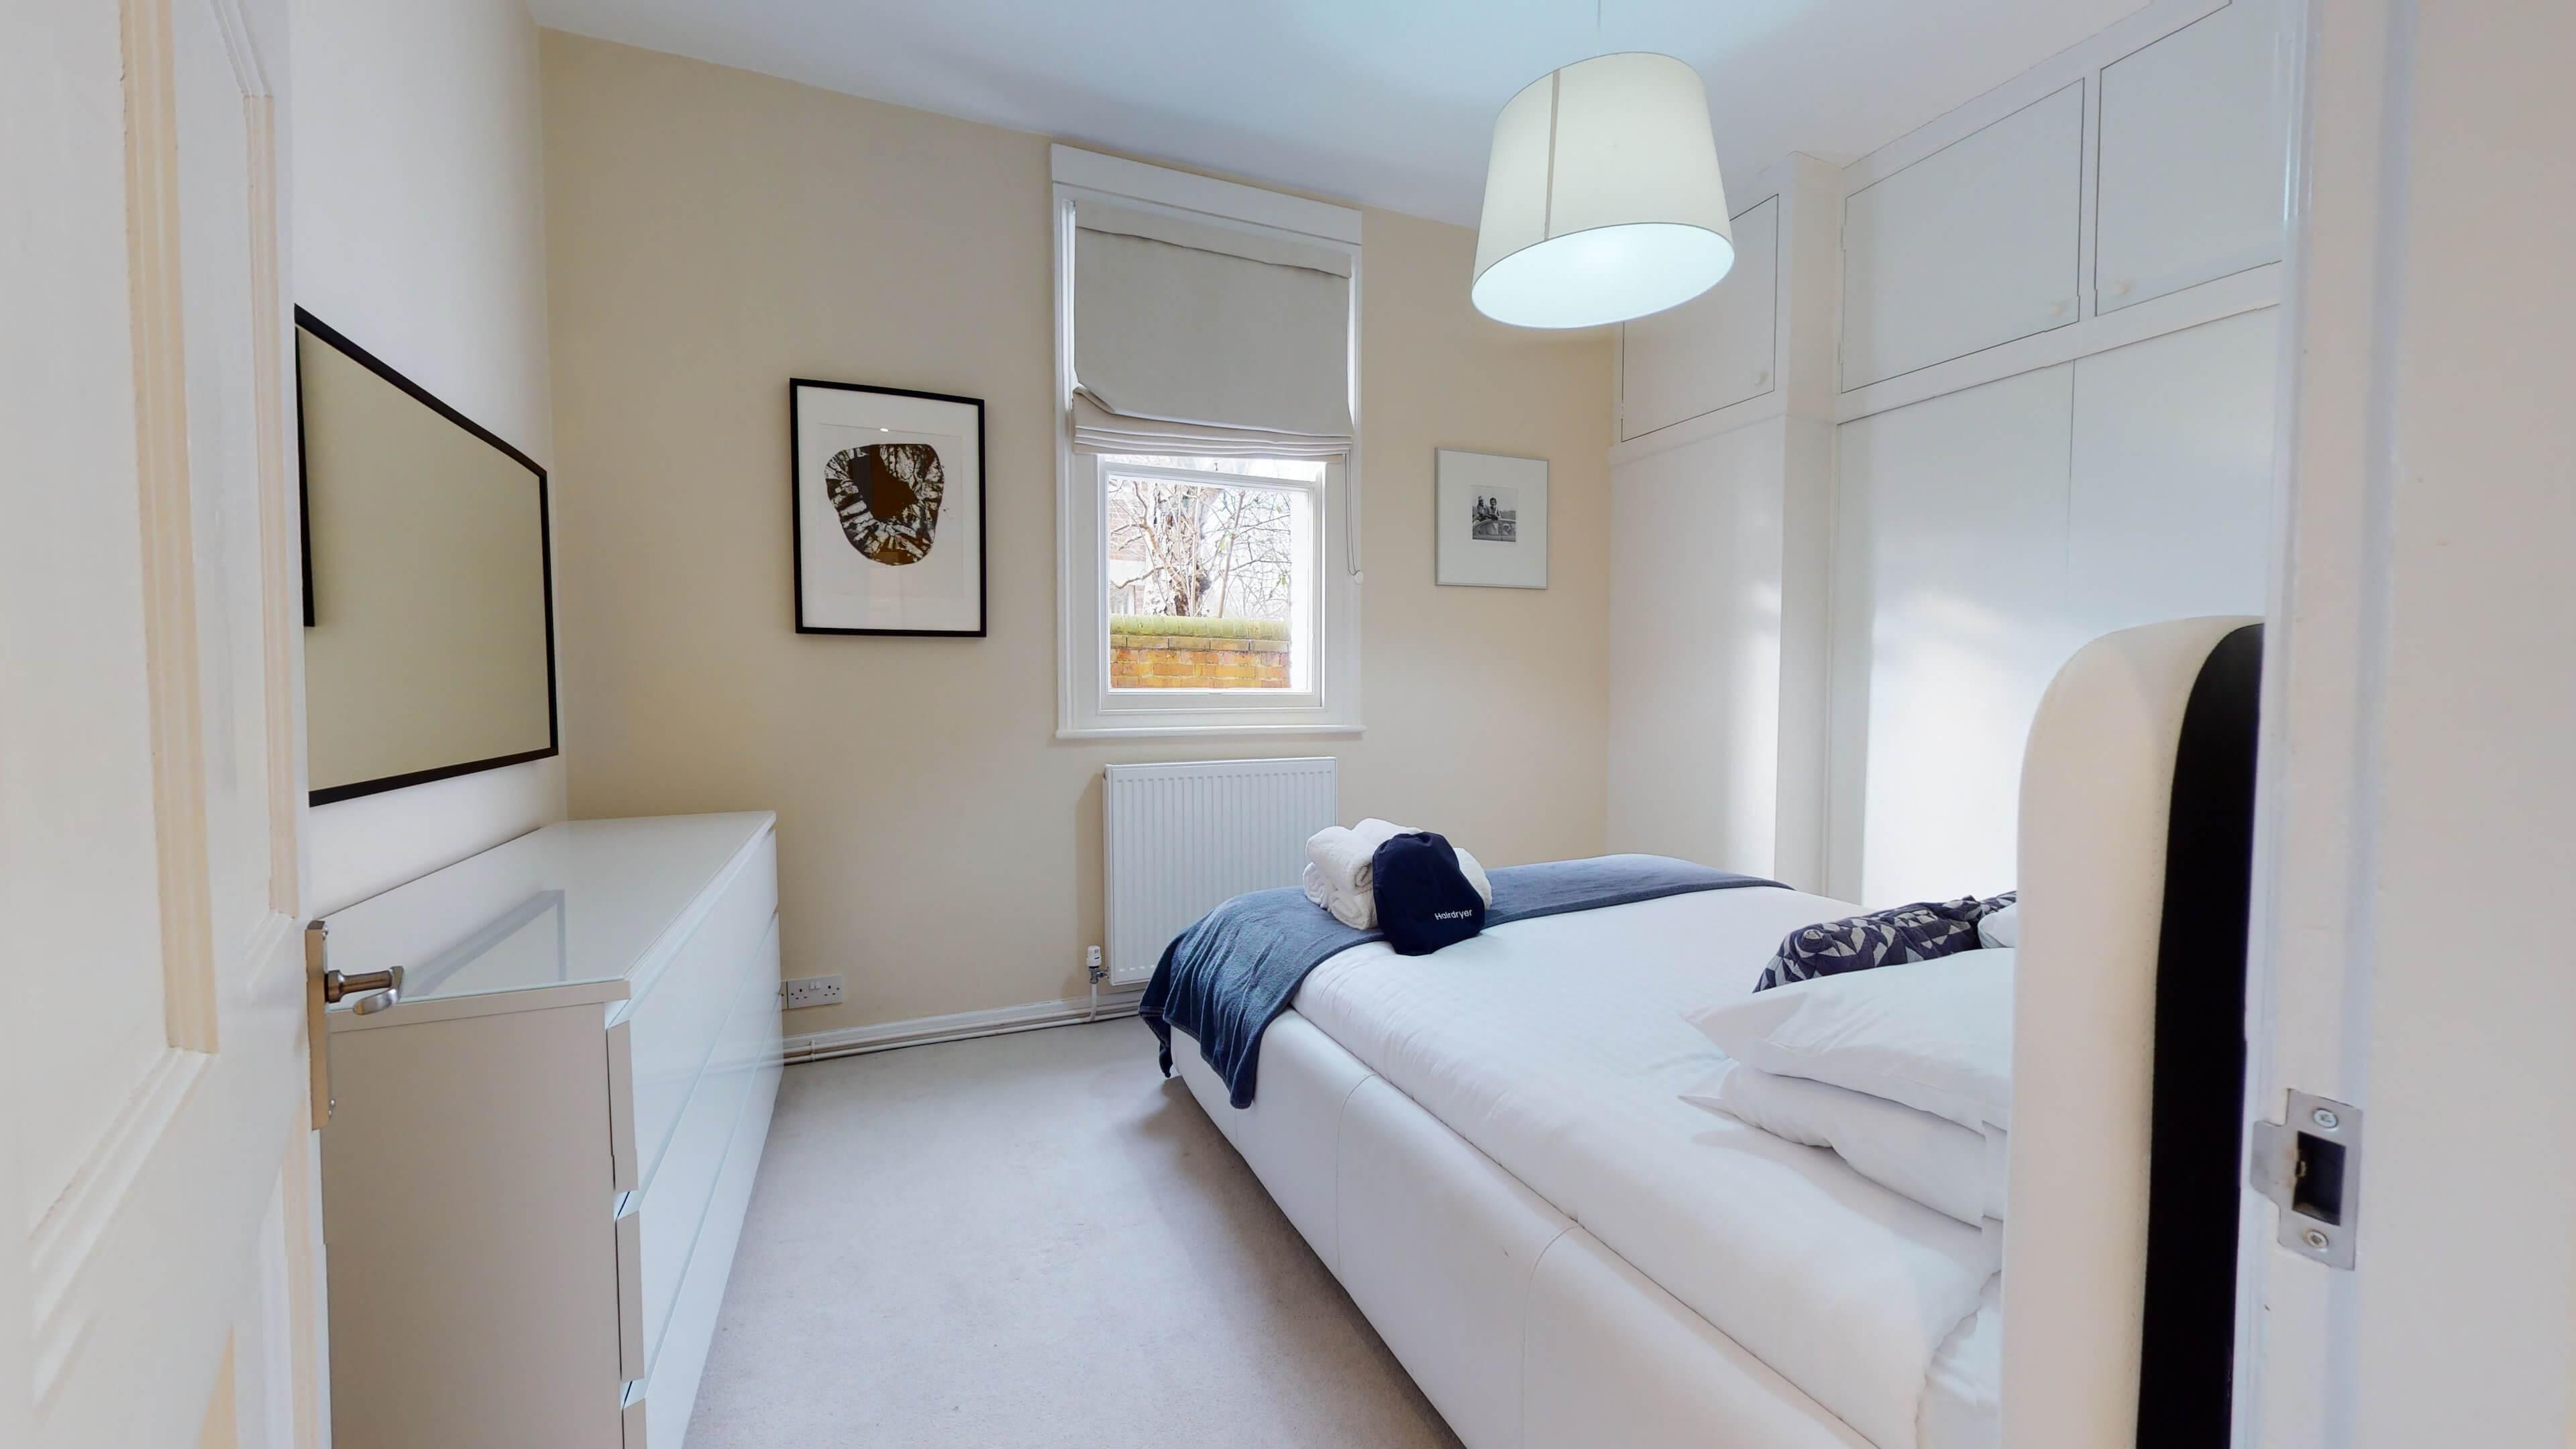 10A Rawlinson Road Rawlinson Road Bedroom 11